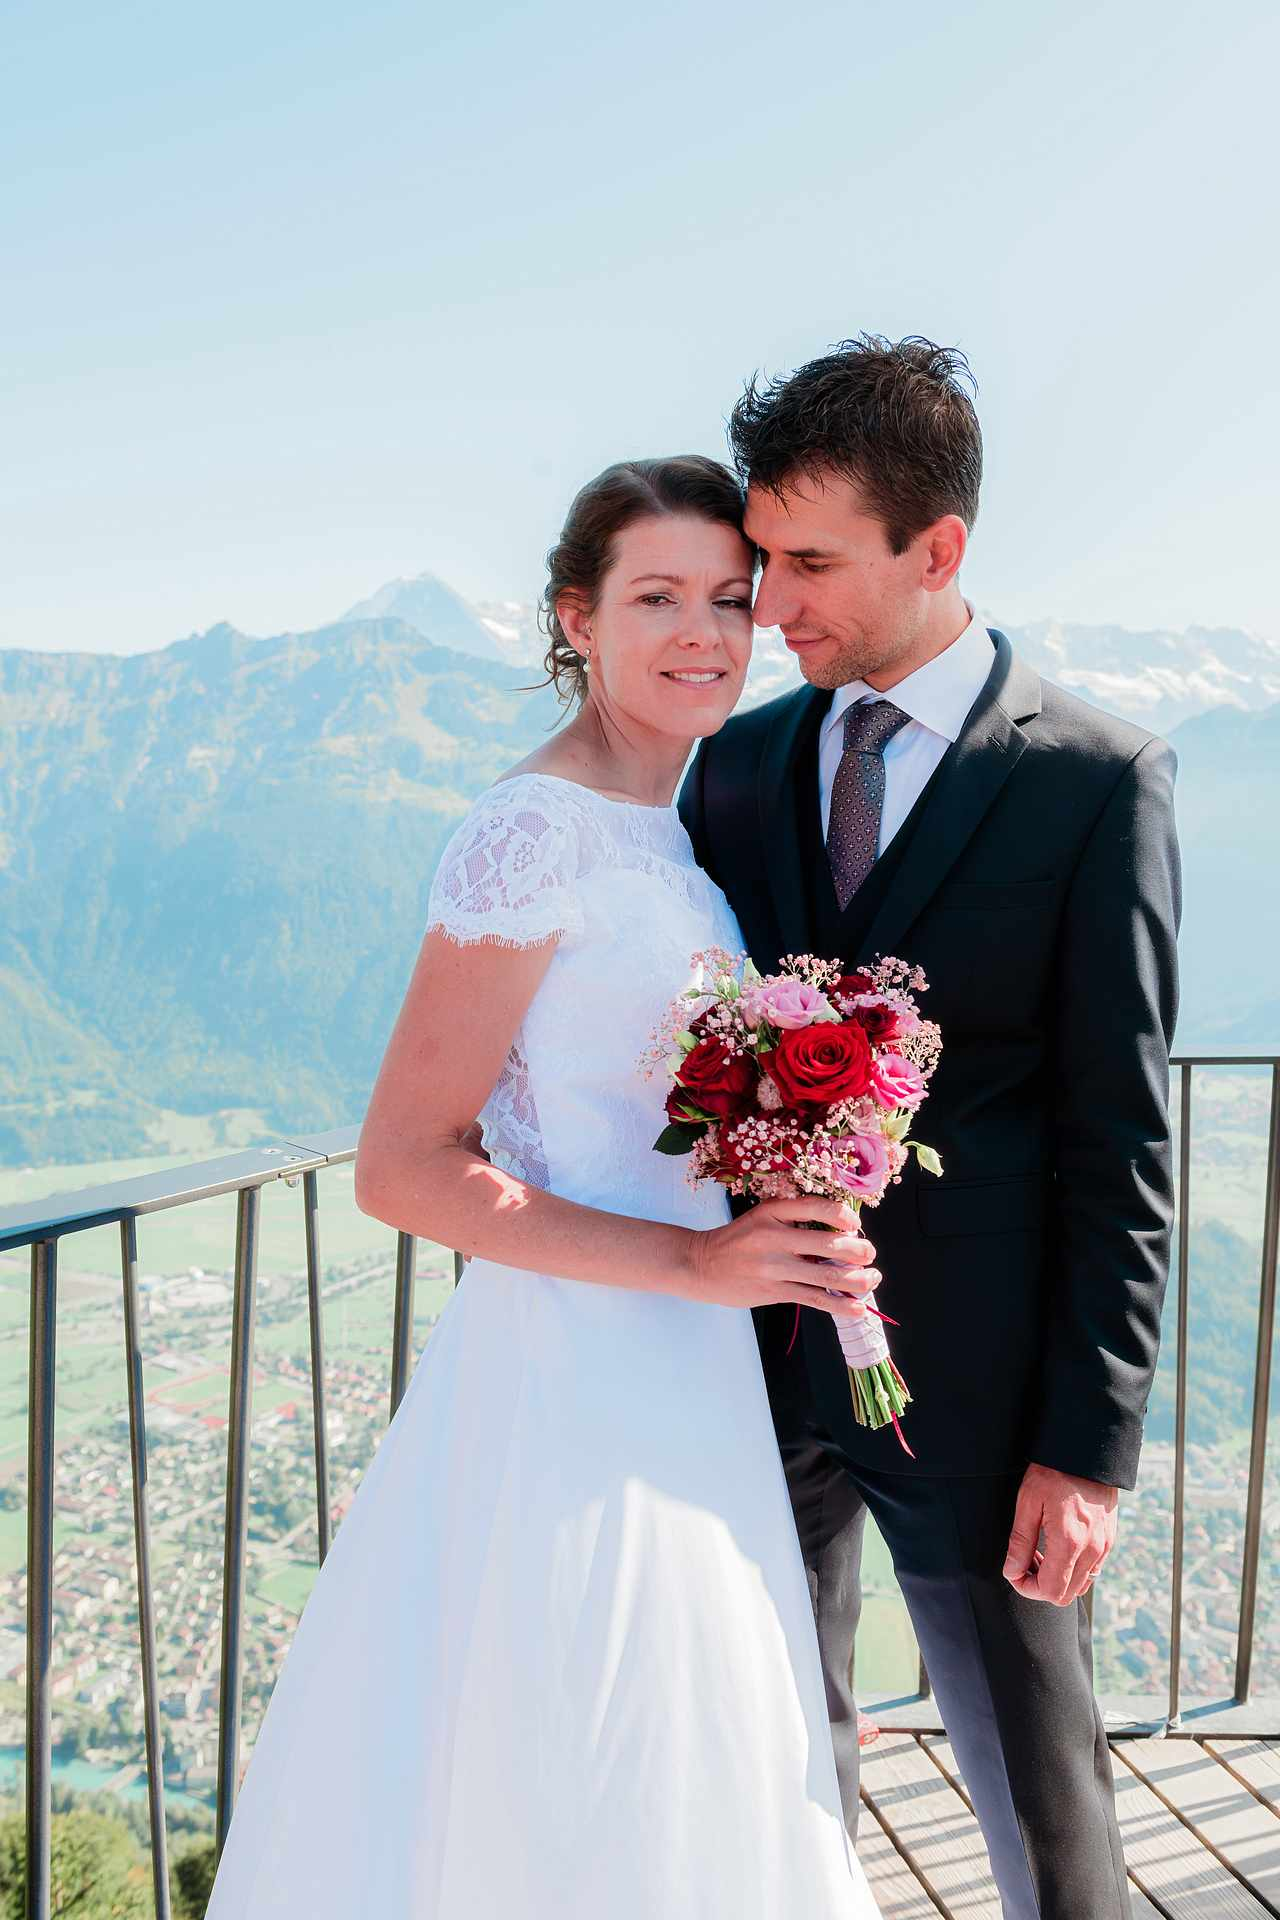 Wedding photographer Harder Kulm Interlaken